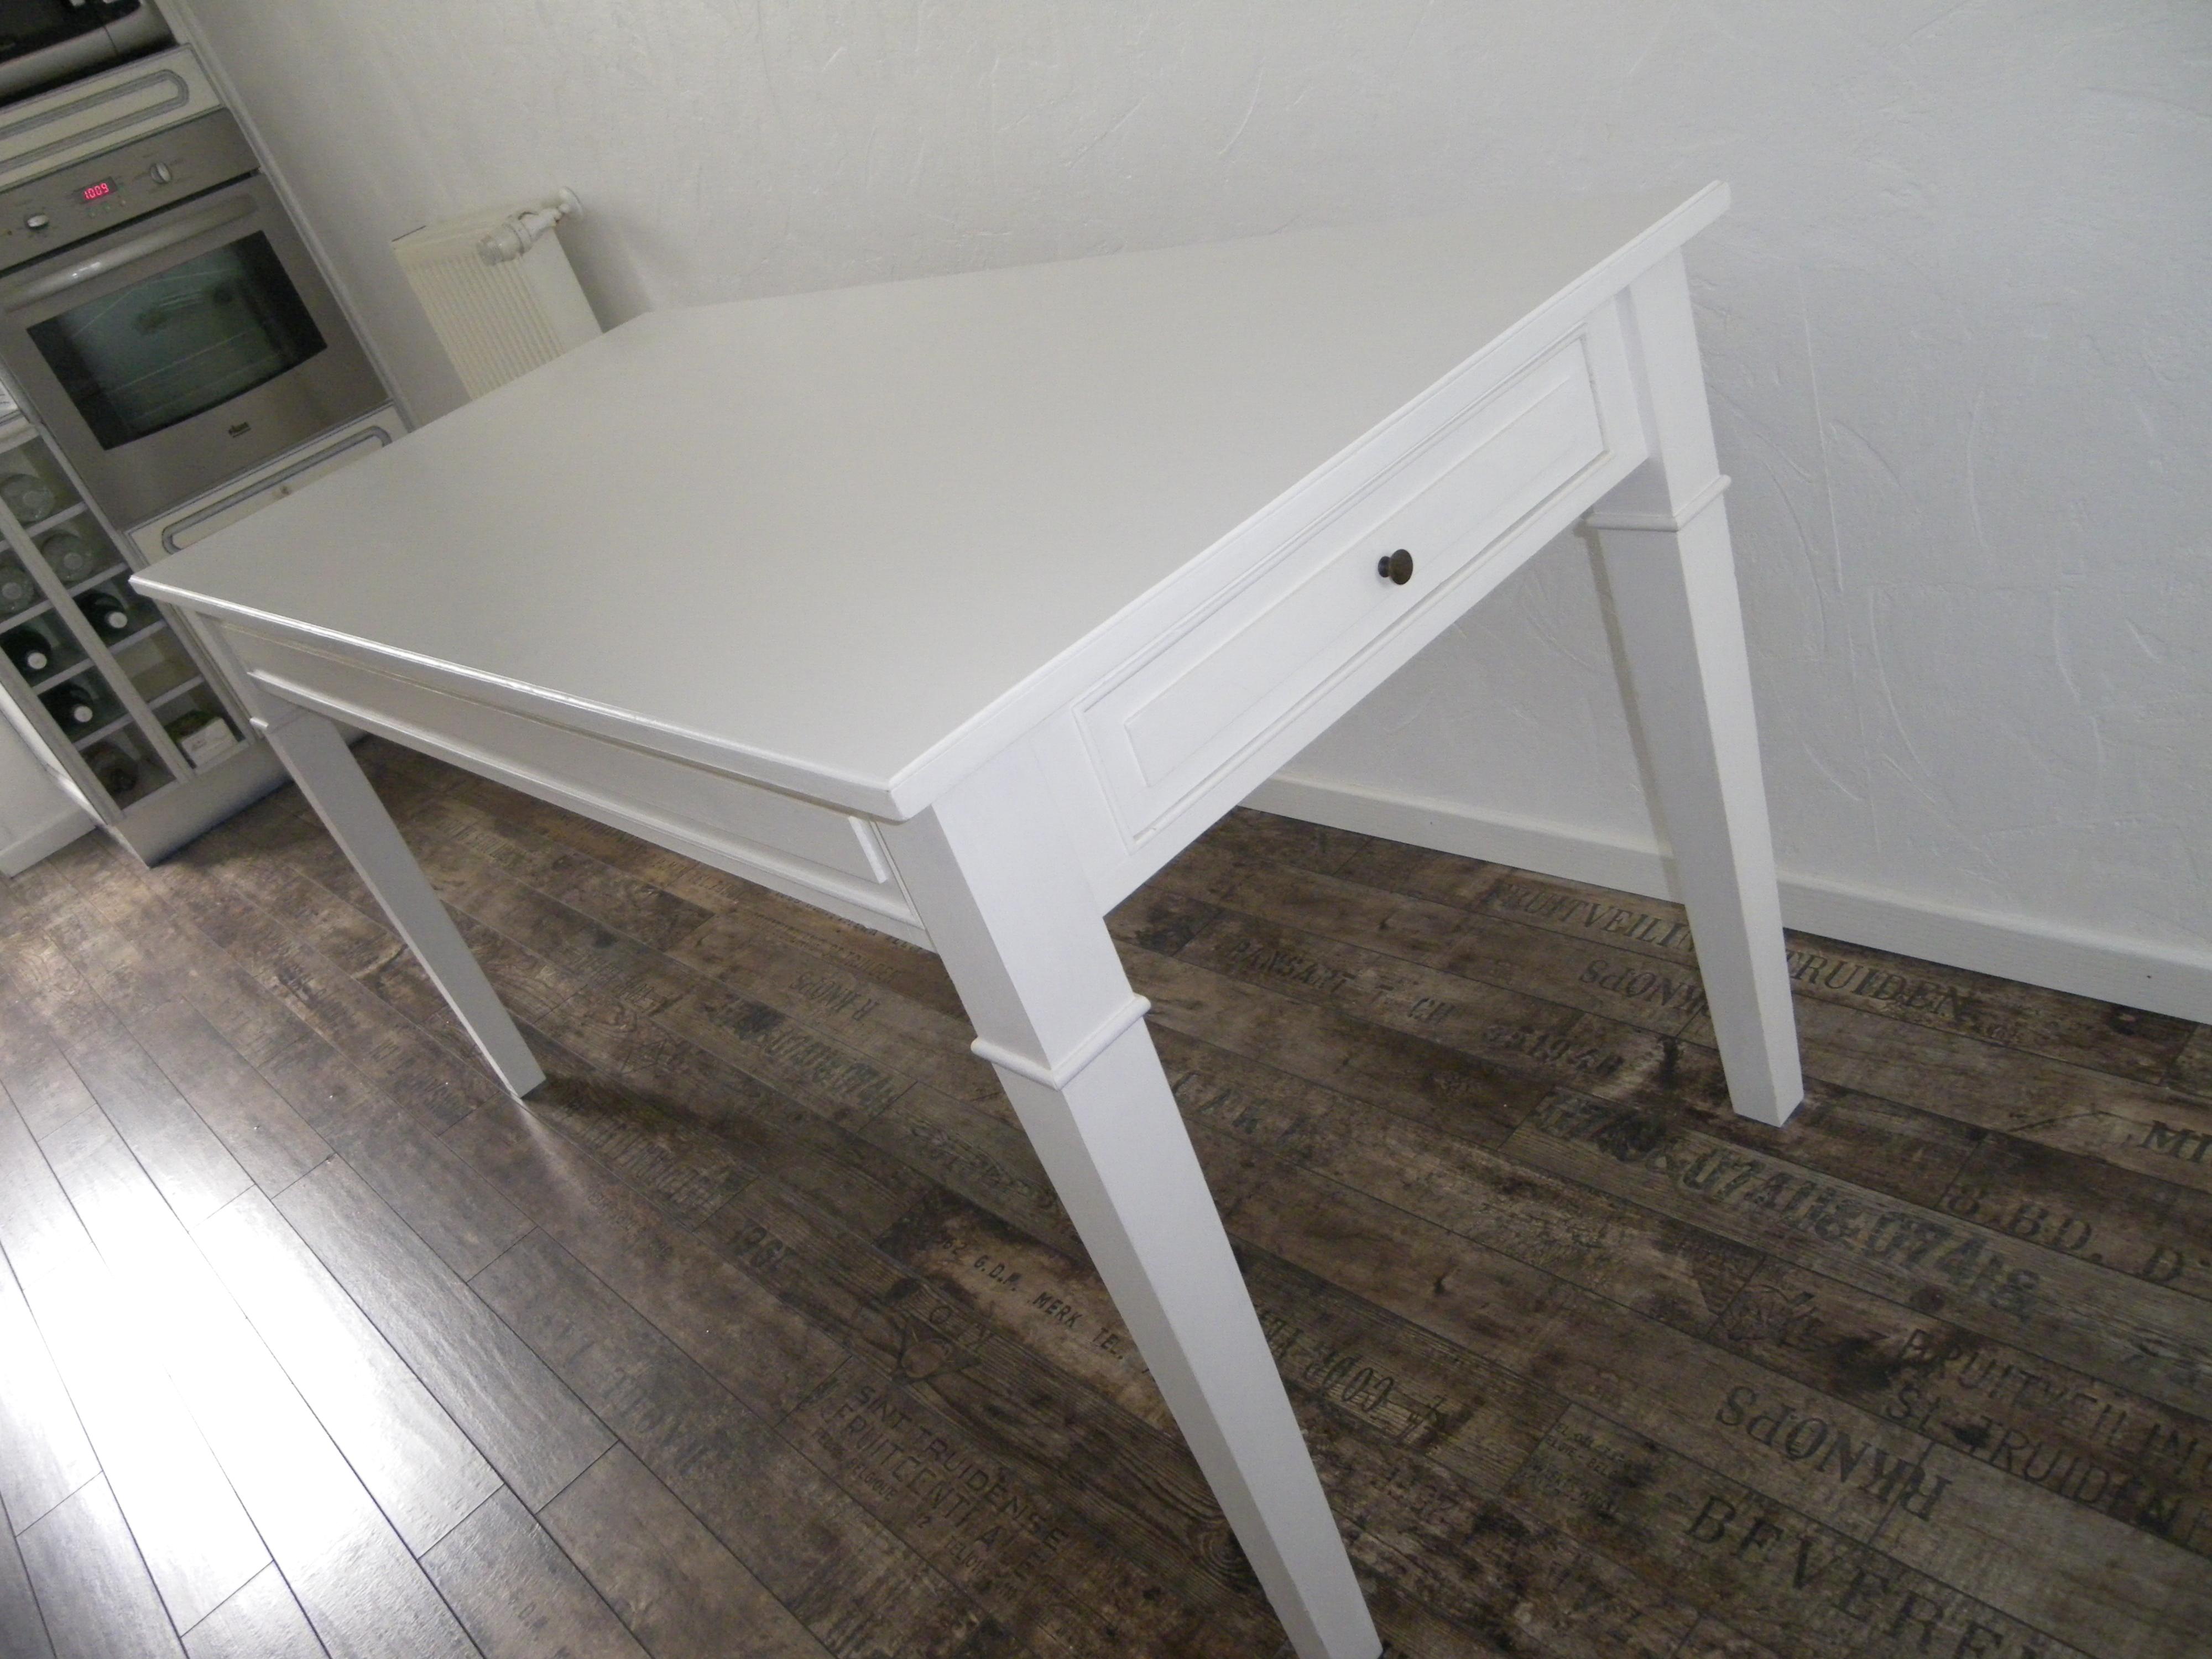 table de cuisine salle manger peinte blanche anjoudeco. Black Bedroom Furniture Sets. Home Design Ideas